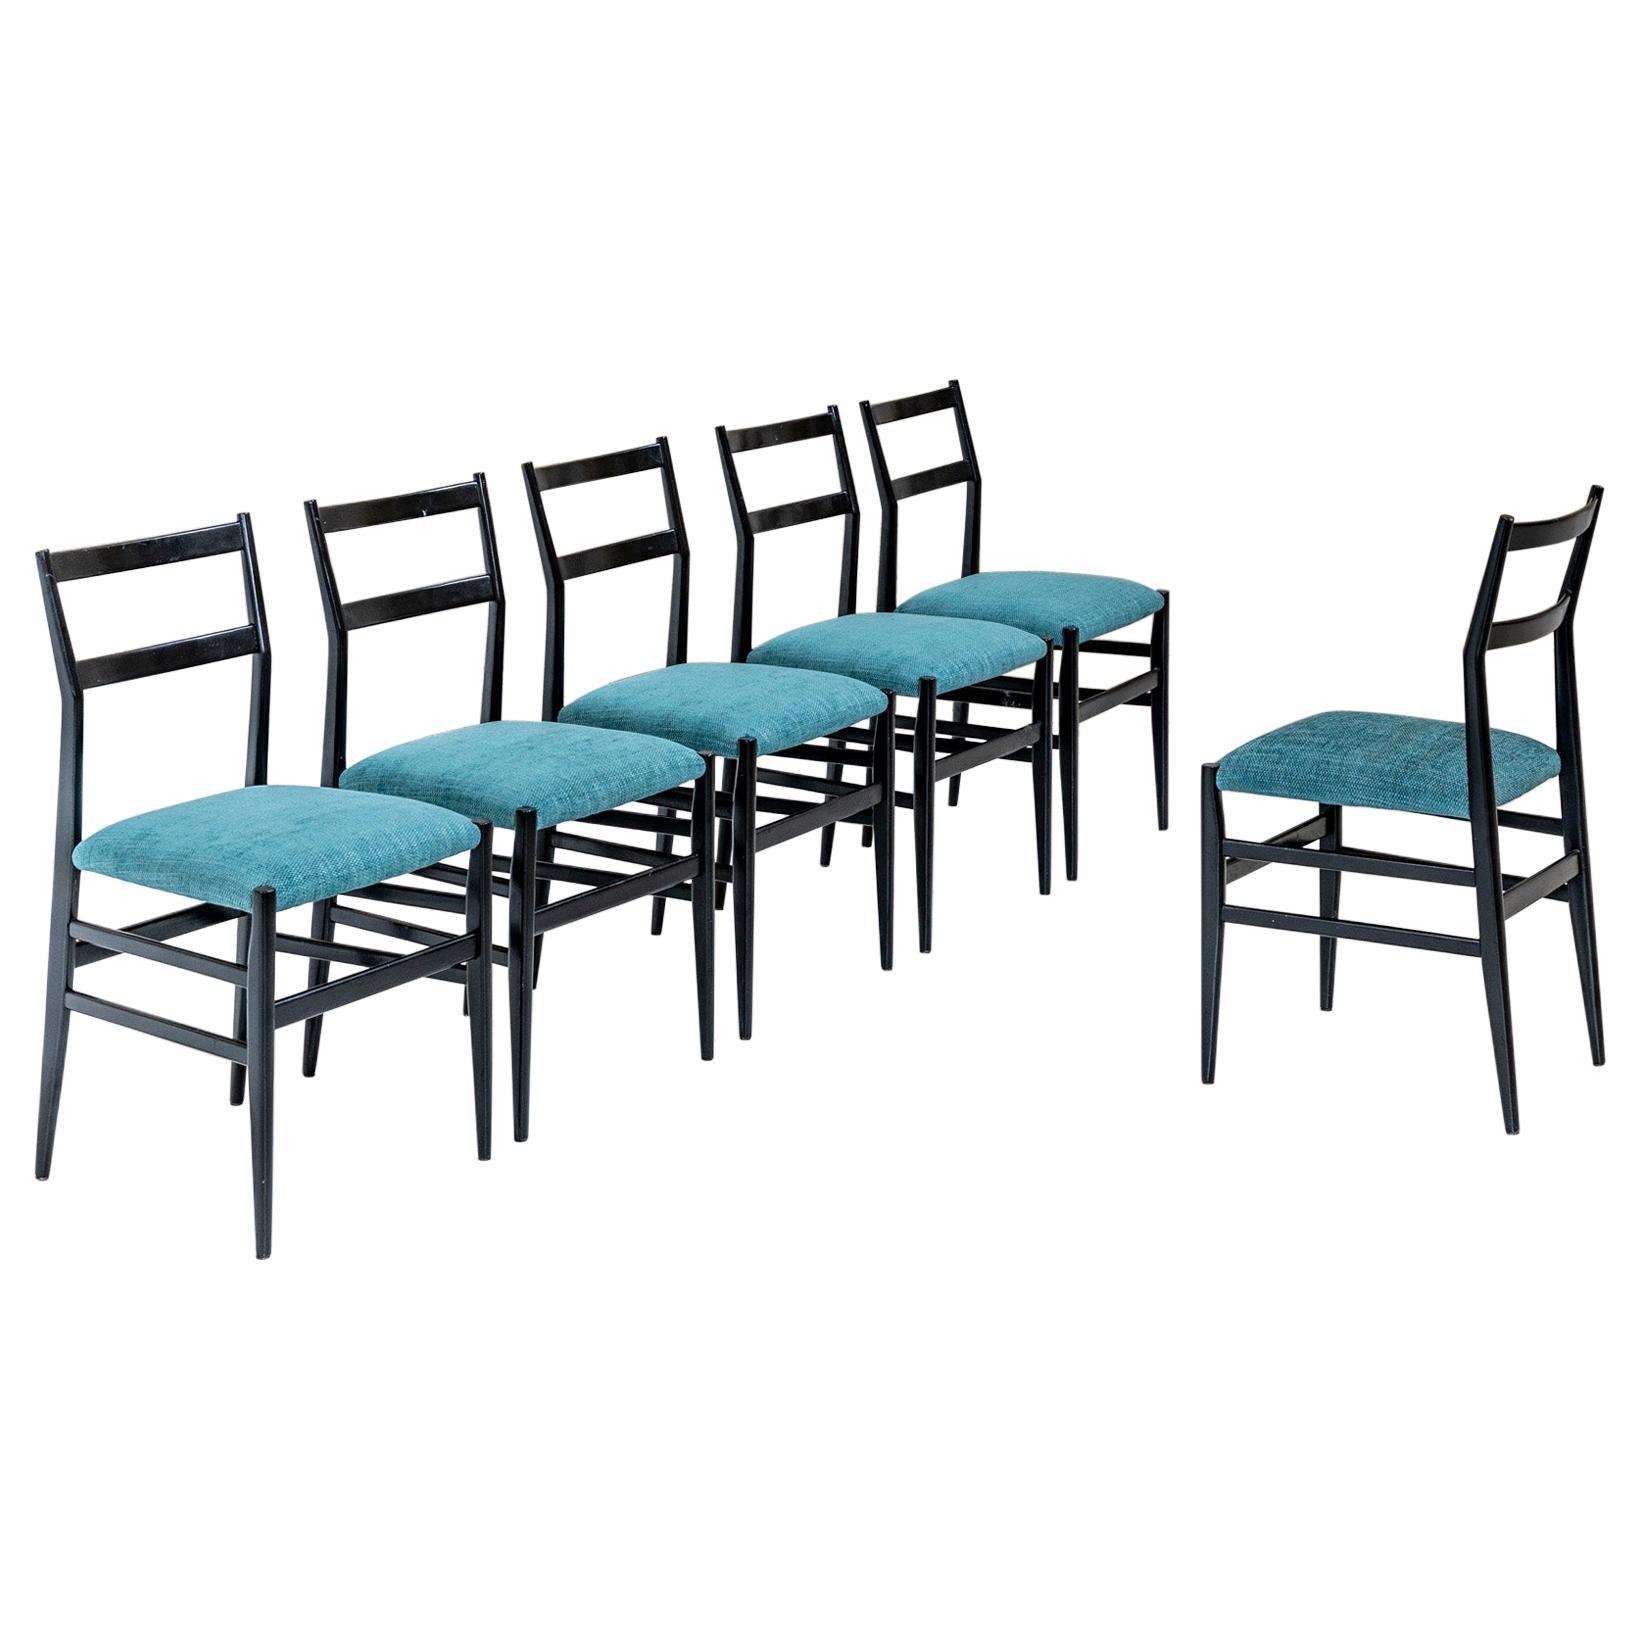 "Set of Six ""Leggera"" Chairs by Gio Ponti"